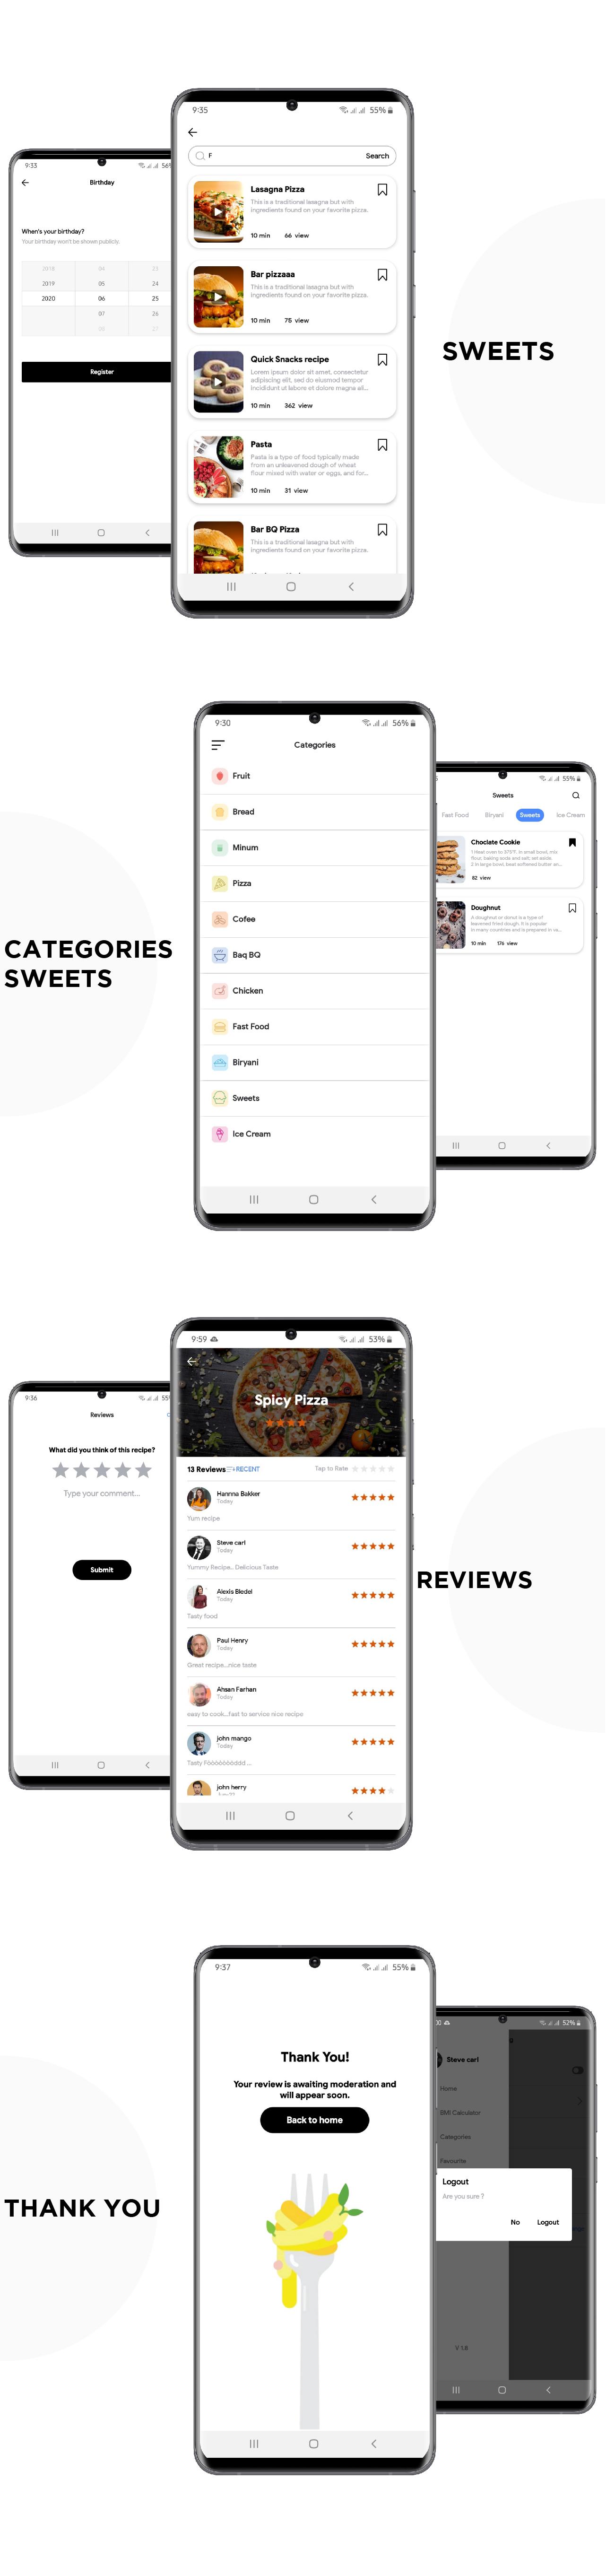 Flutter Recipe App UI KIT Template - 3